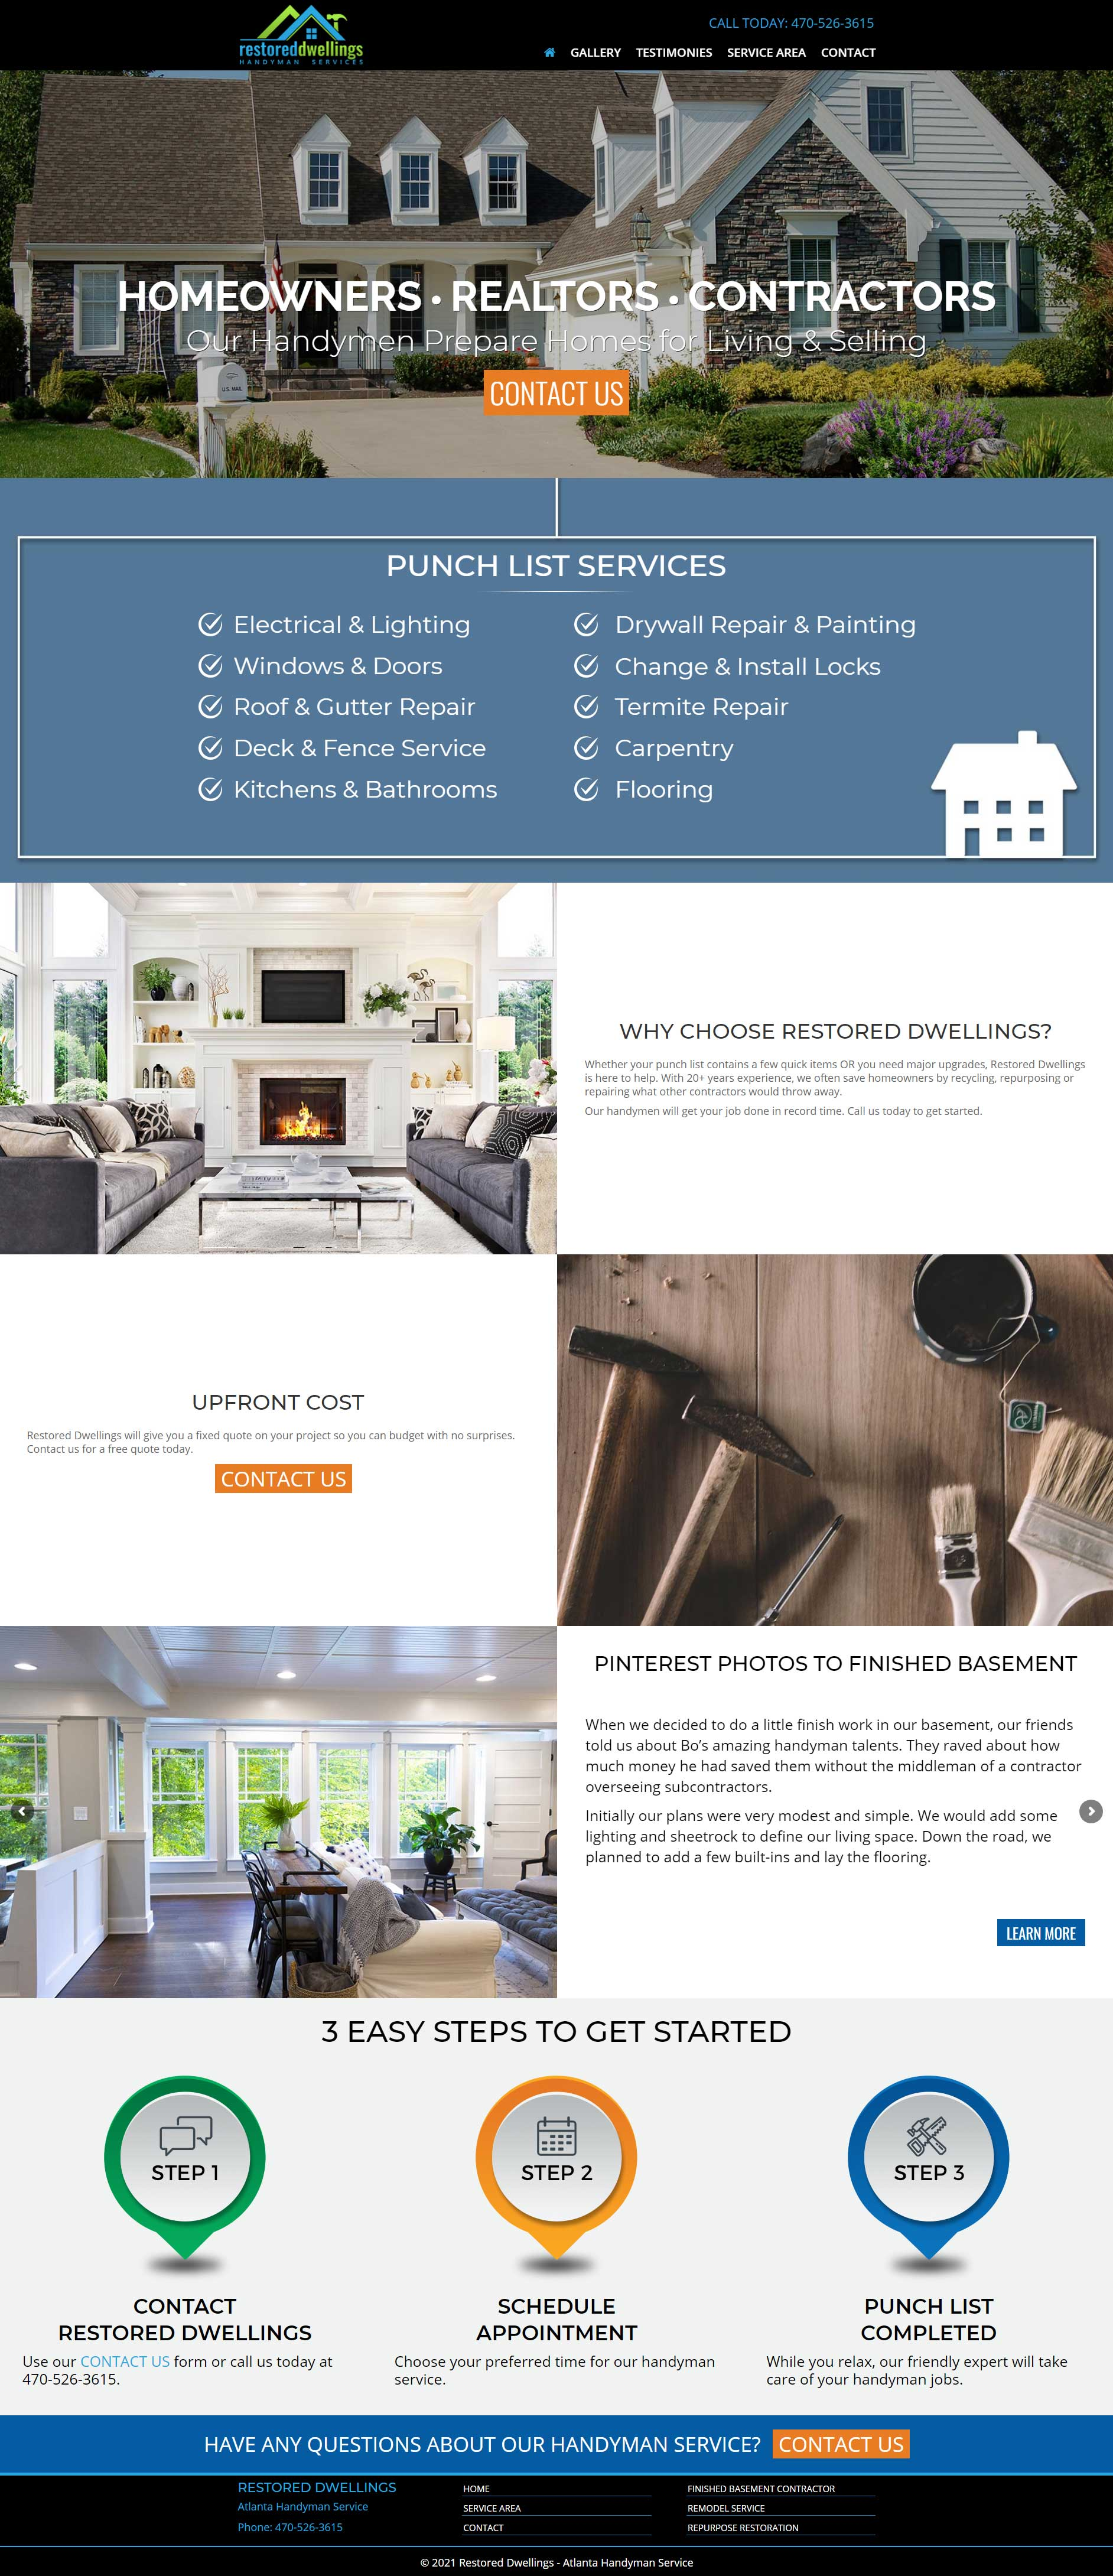 restoreddwellings-handyman-service